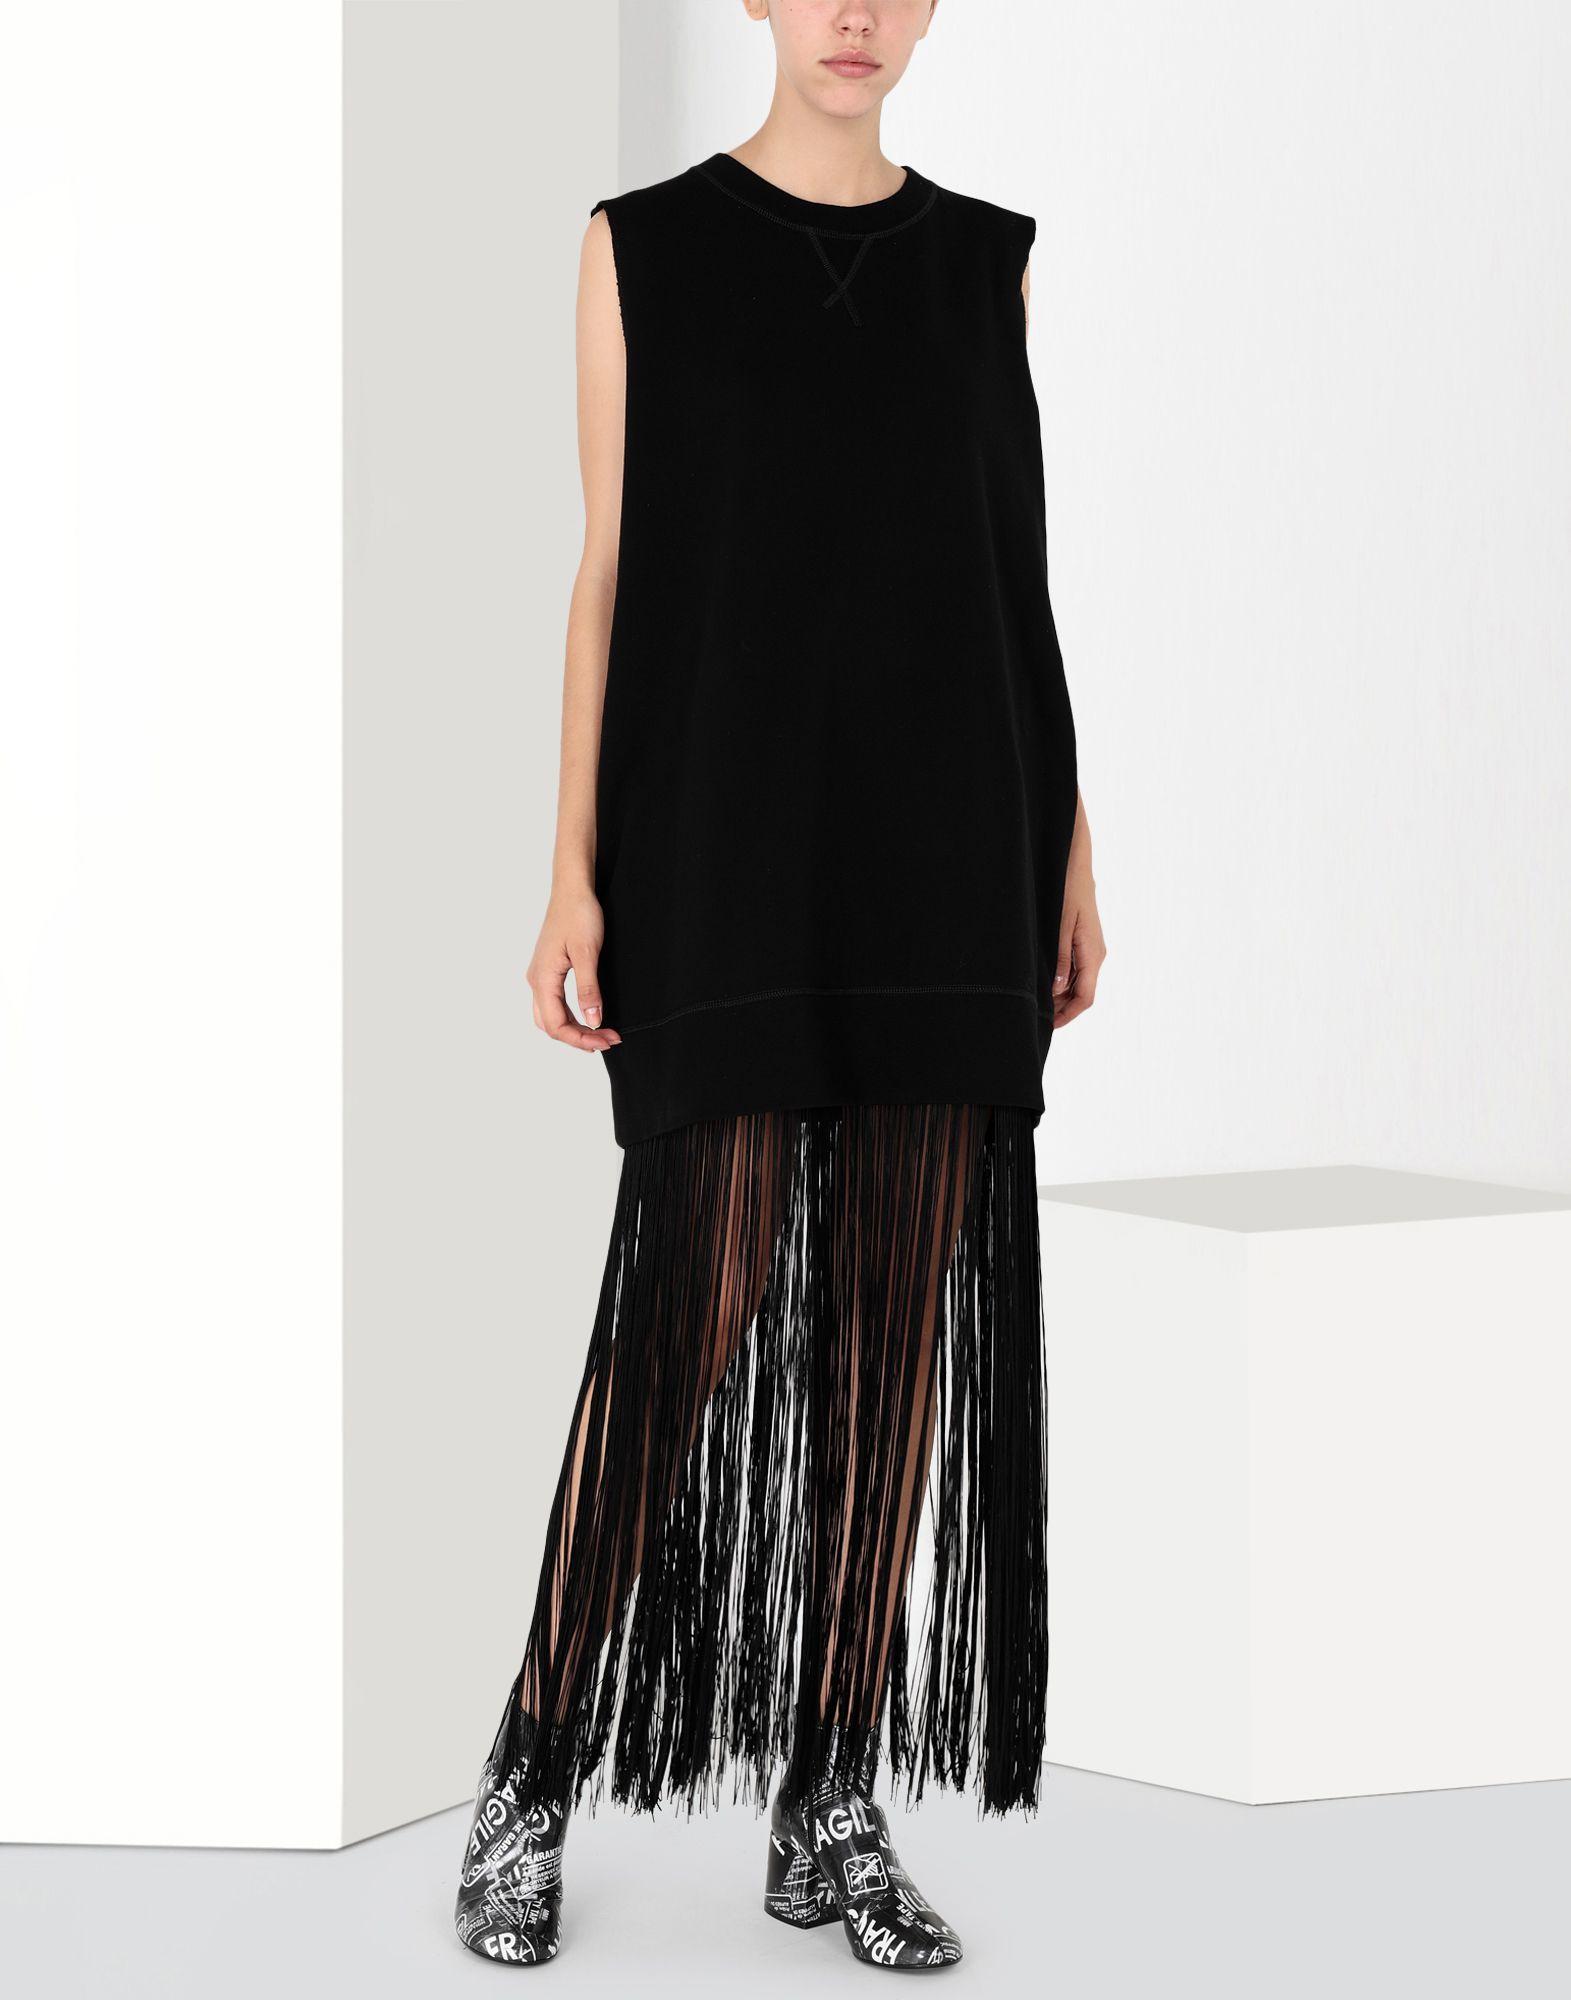 MM6 MAISON MARGIELA Jumper dress with fringes Long dress Woman f